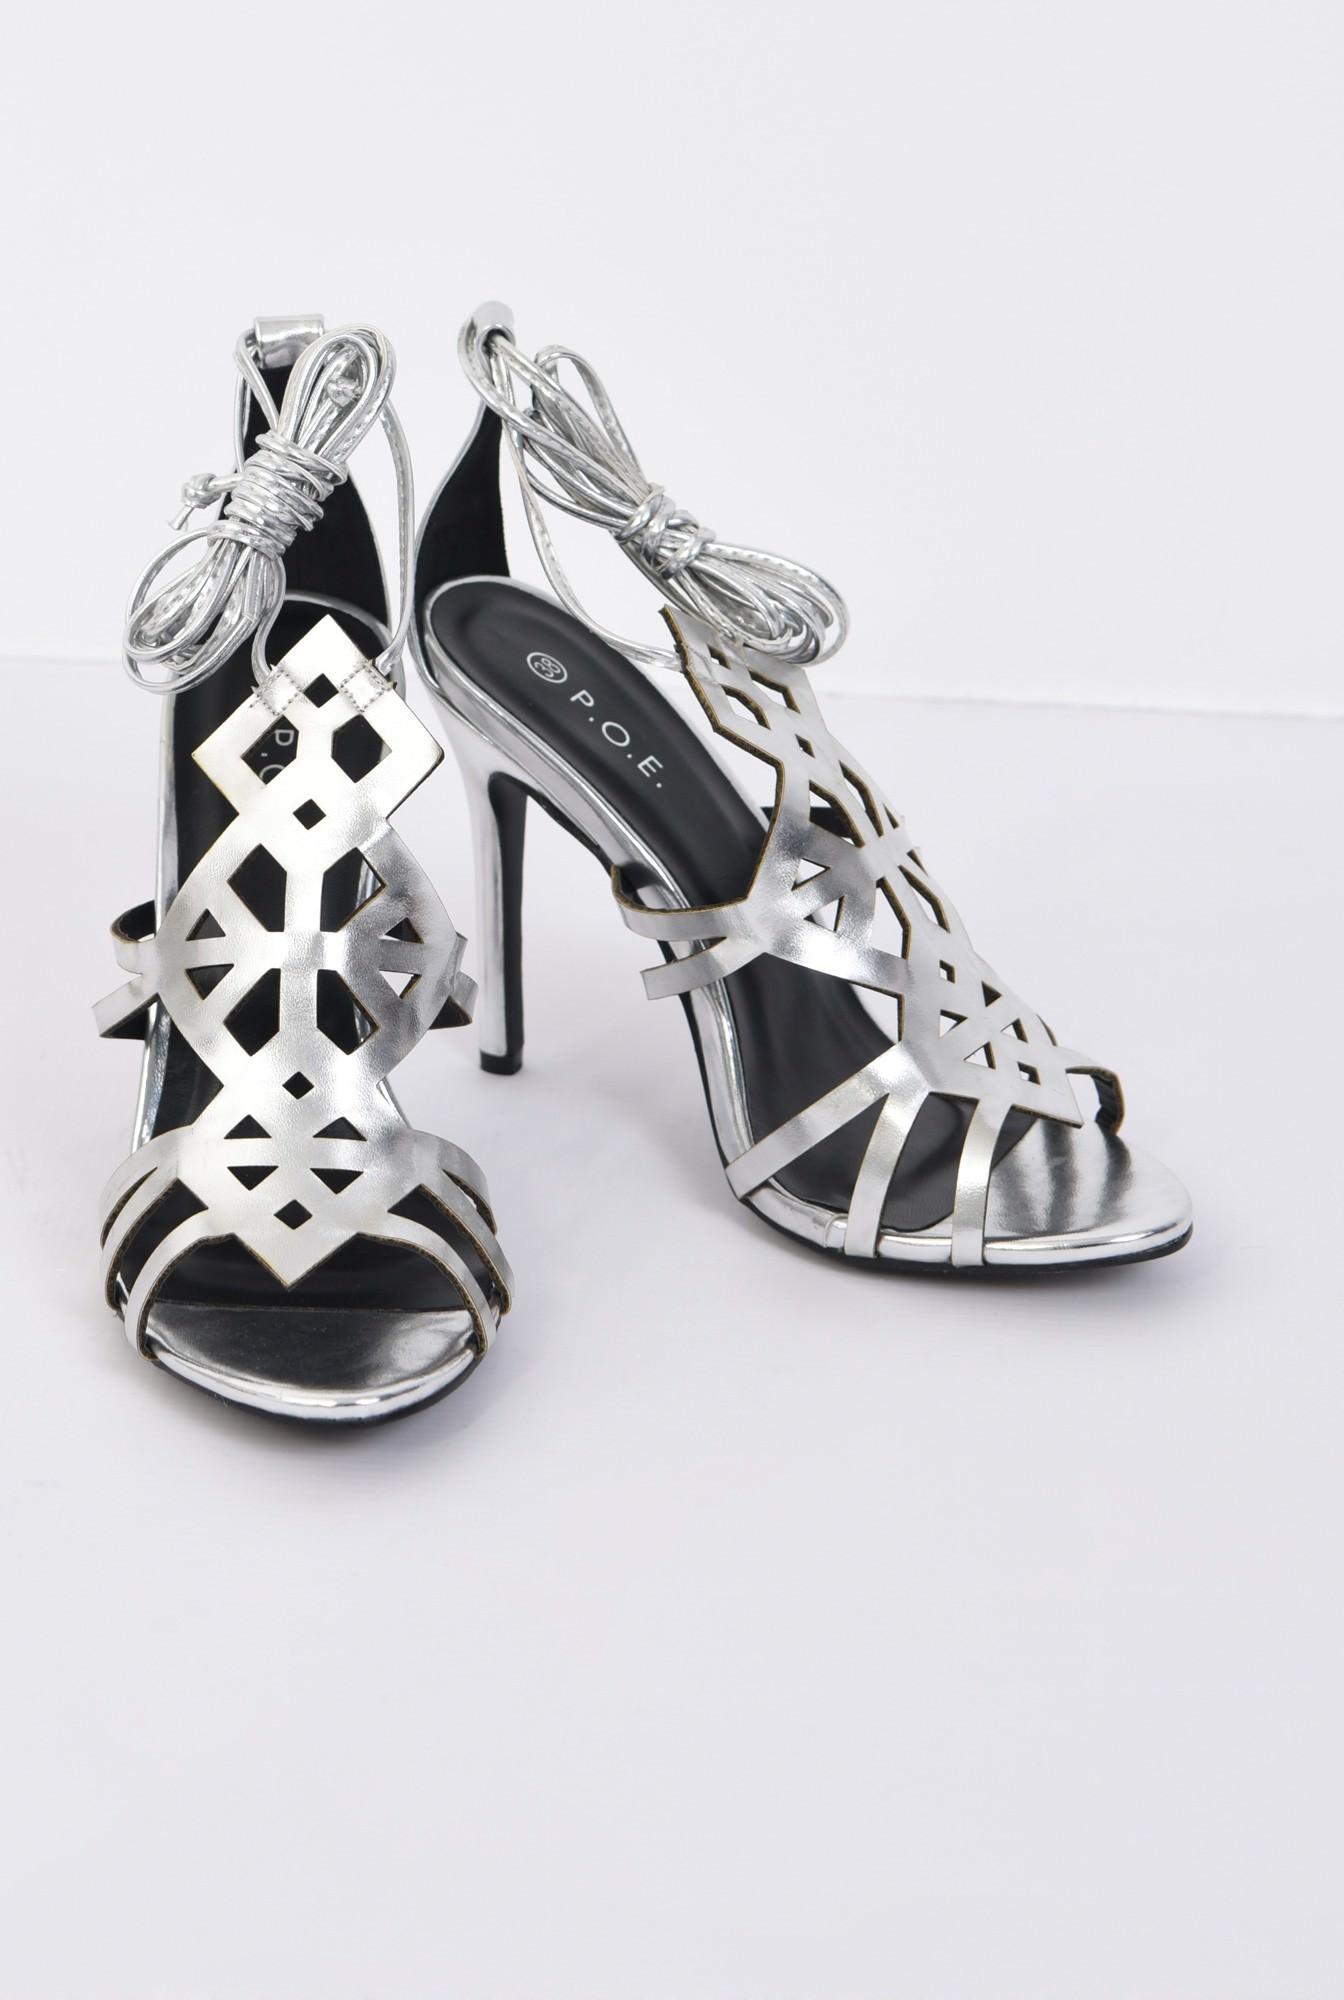 1 - sandale elegante, argintii, metalizate, stiletto